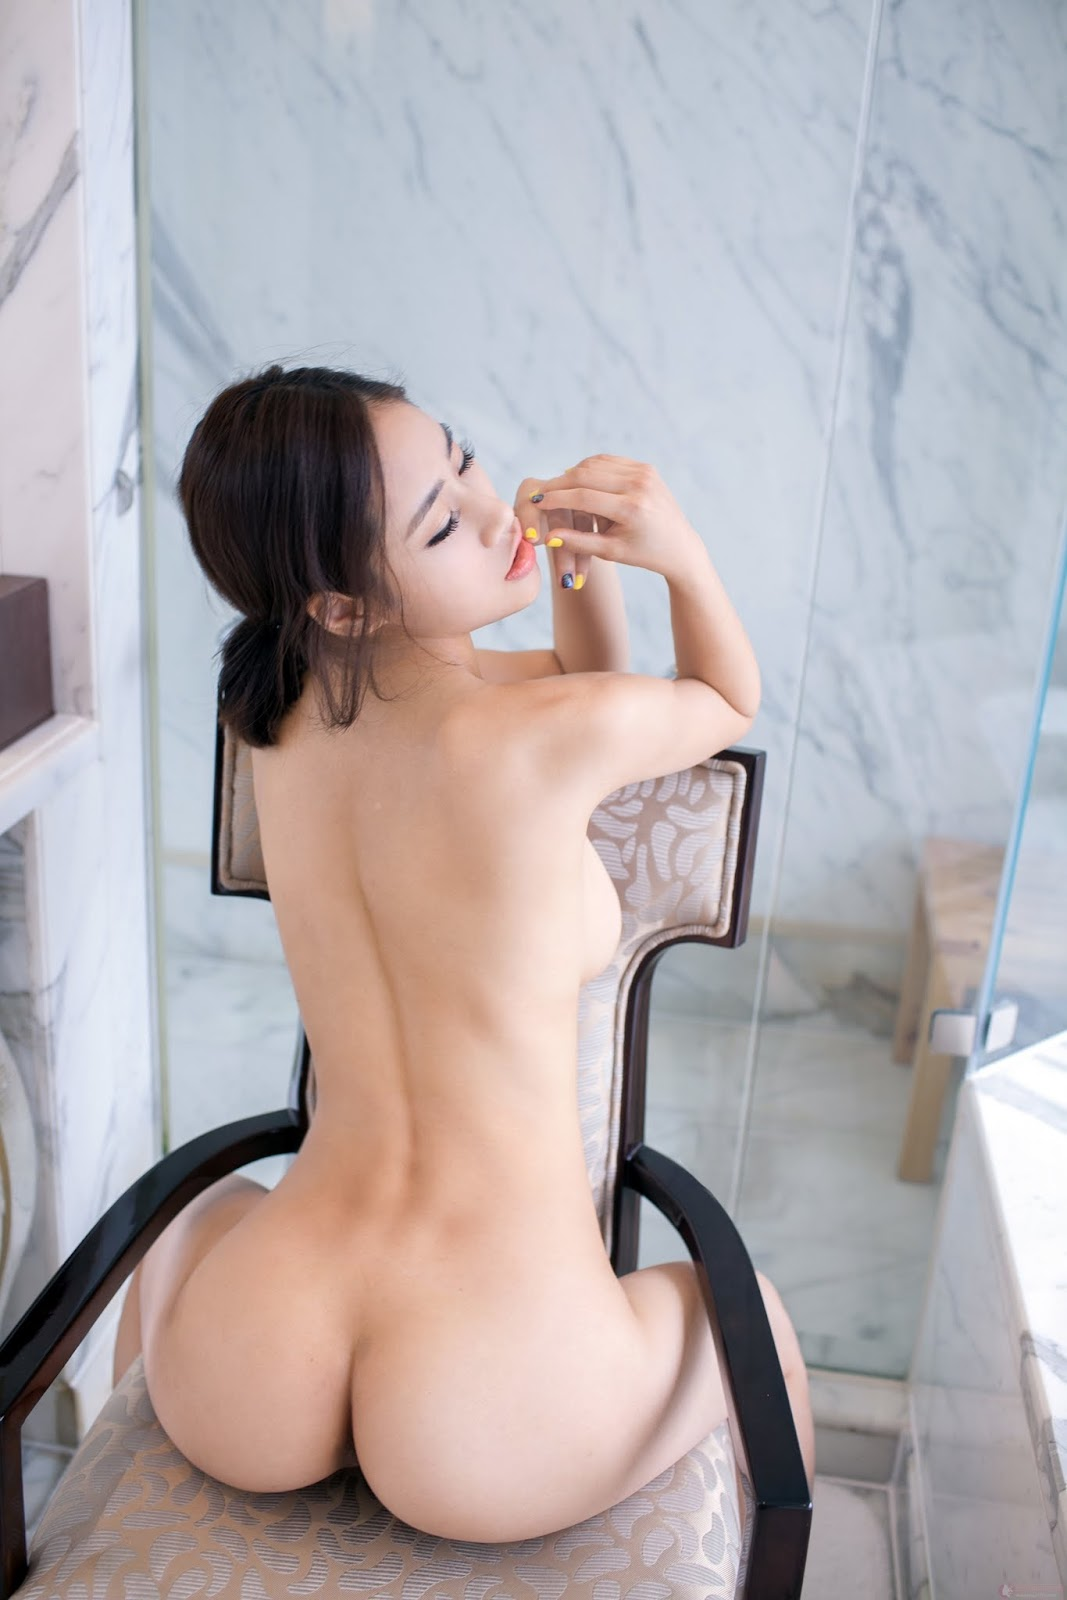 %252B%25C2%25A6%252B%2529%2B%252811%2529 - Hot Girl TUIGIRL NO.53 Sexy